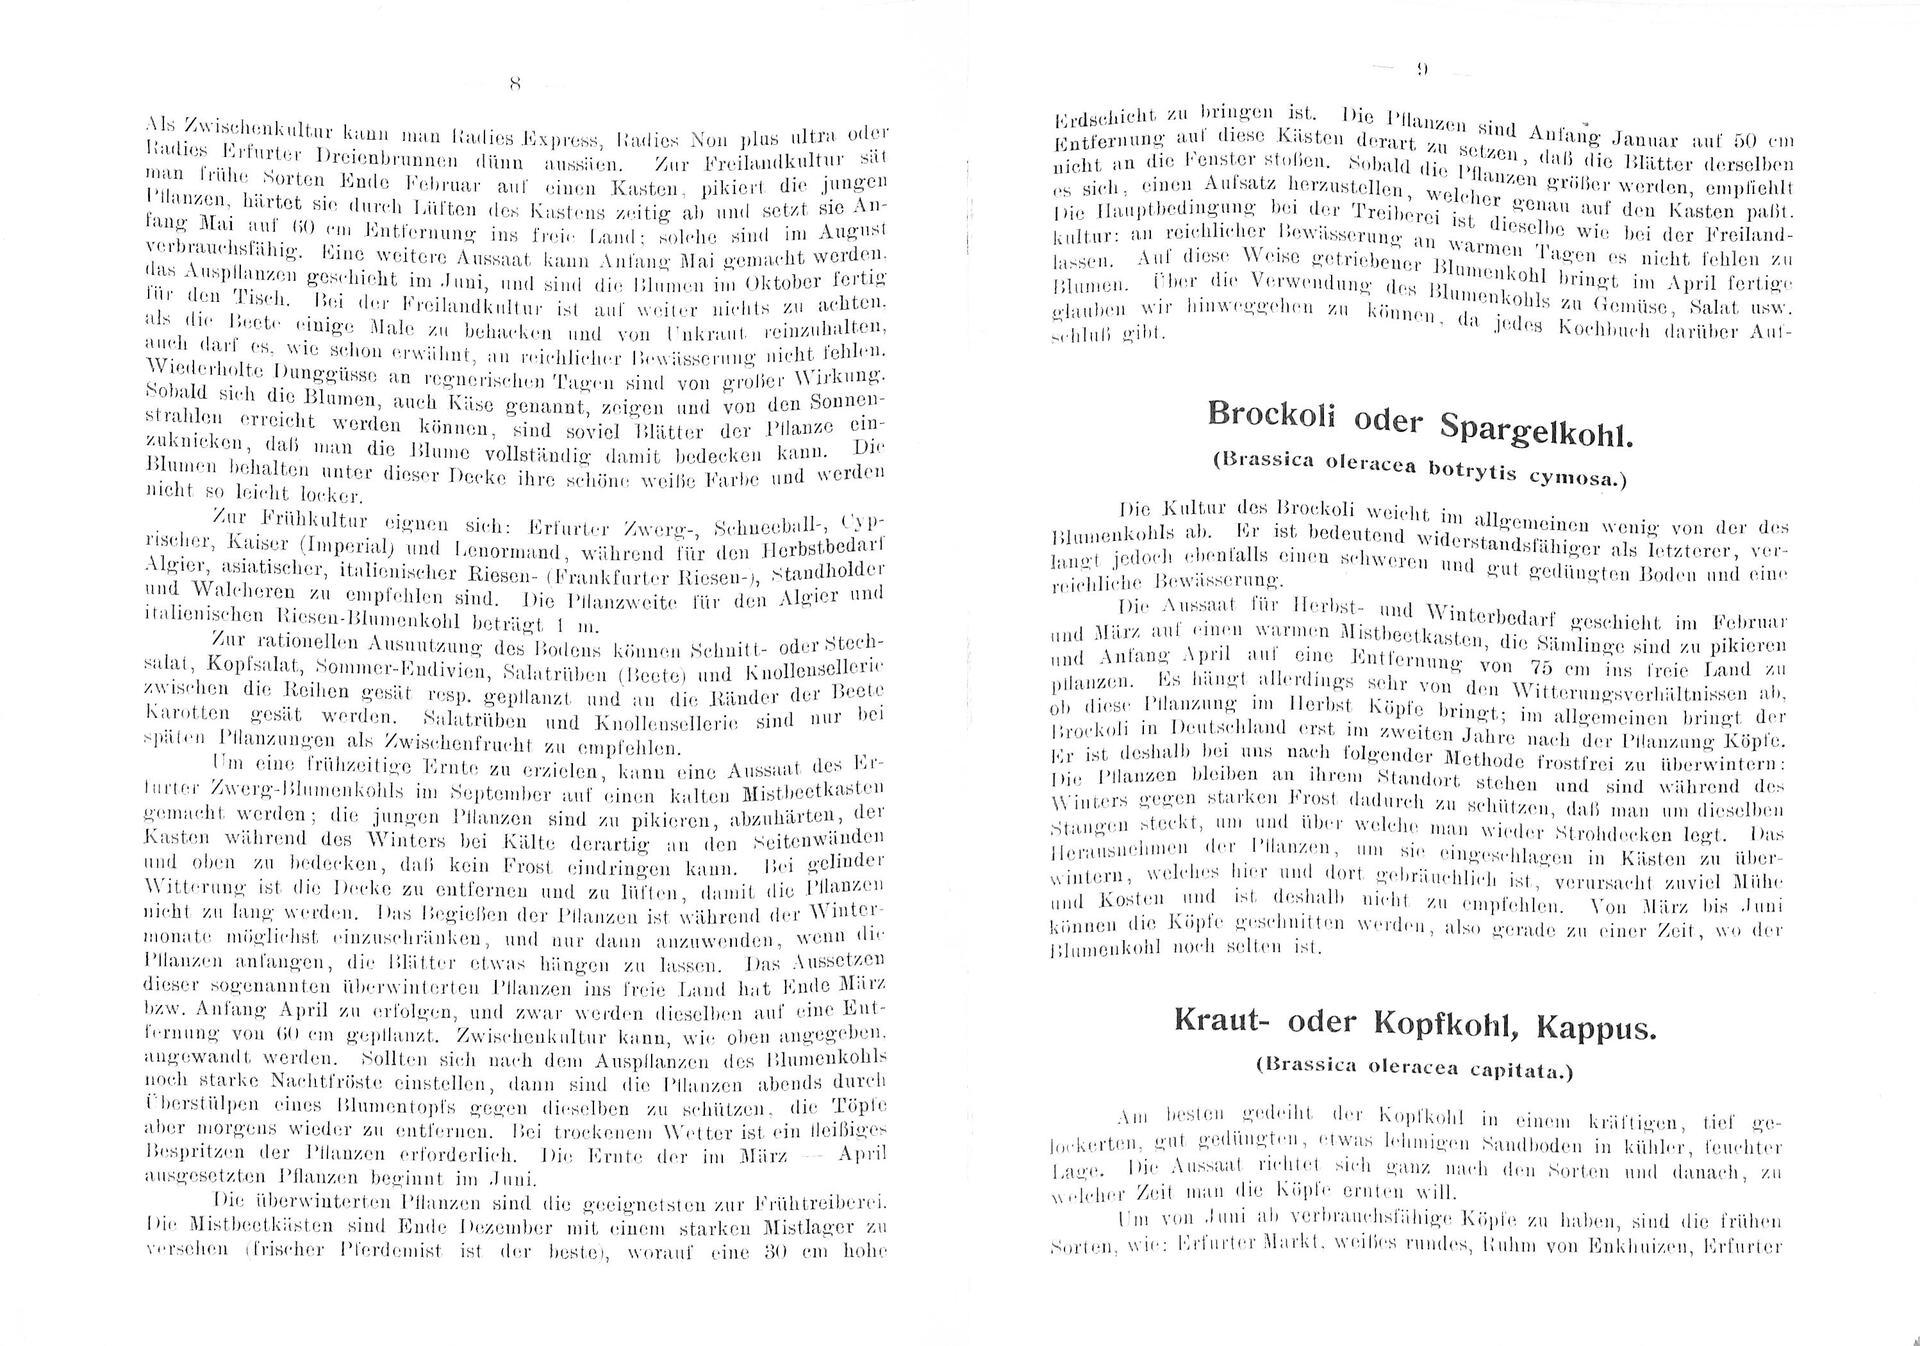 LiebauGemuesegaertner.39.8.9.jpg